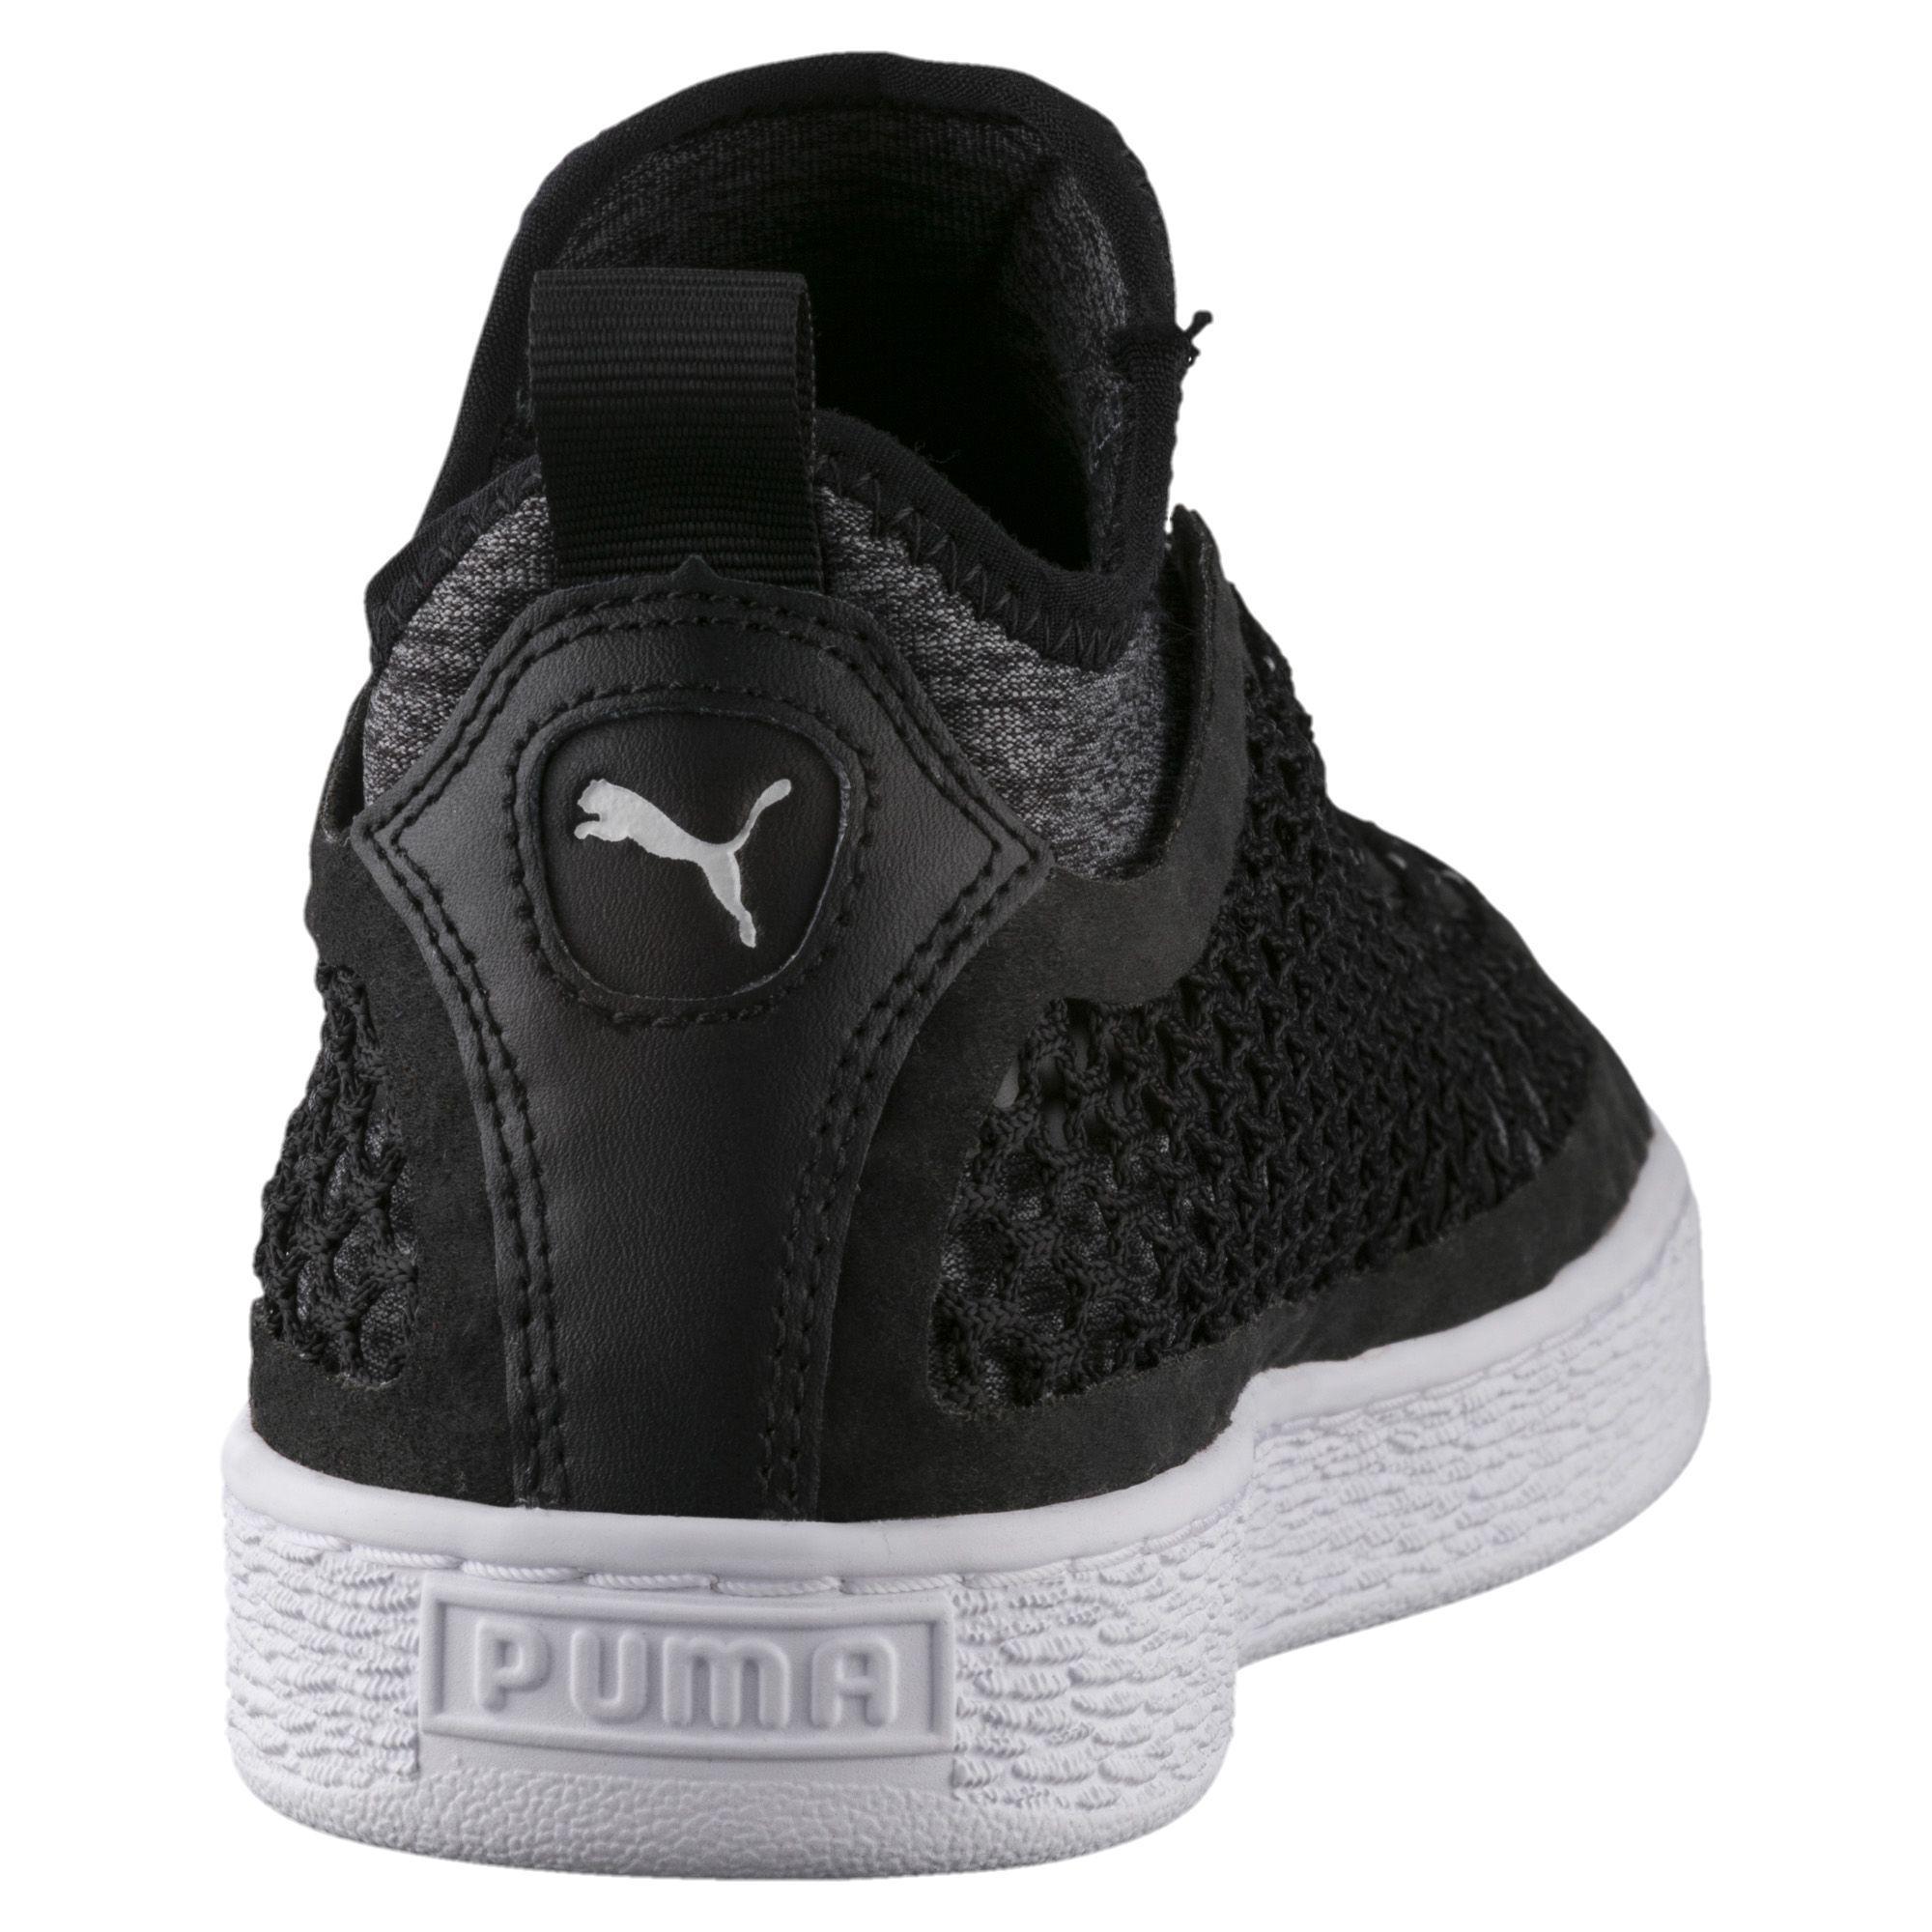 Lyst - PUMA Basket Classic Netfit Sneakers in Black for Men b06f57e11